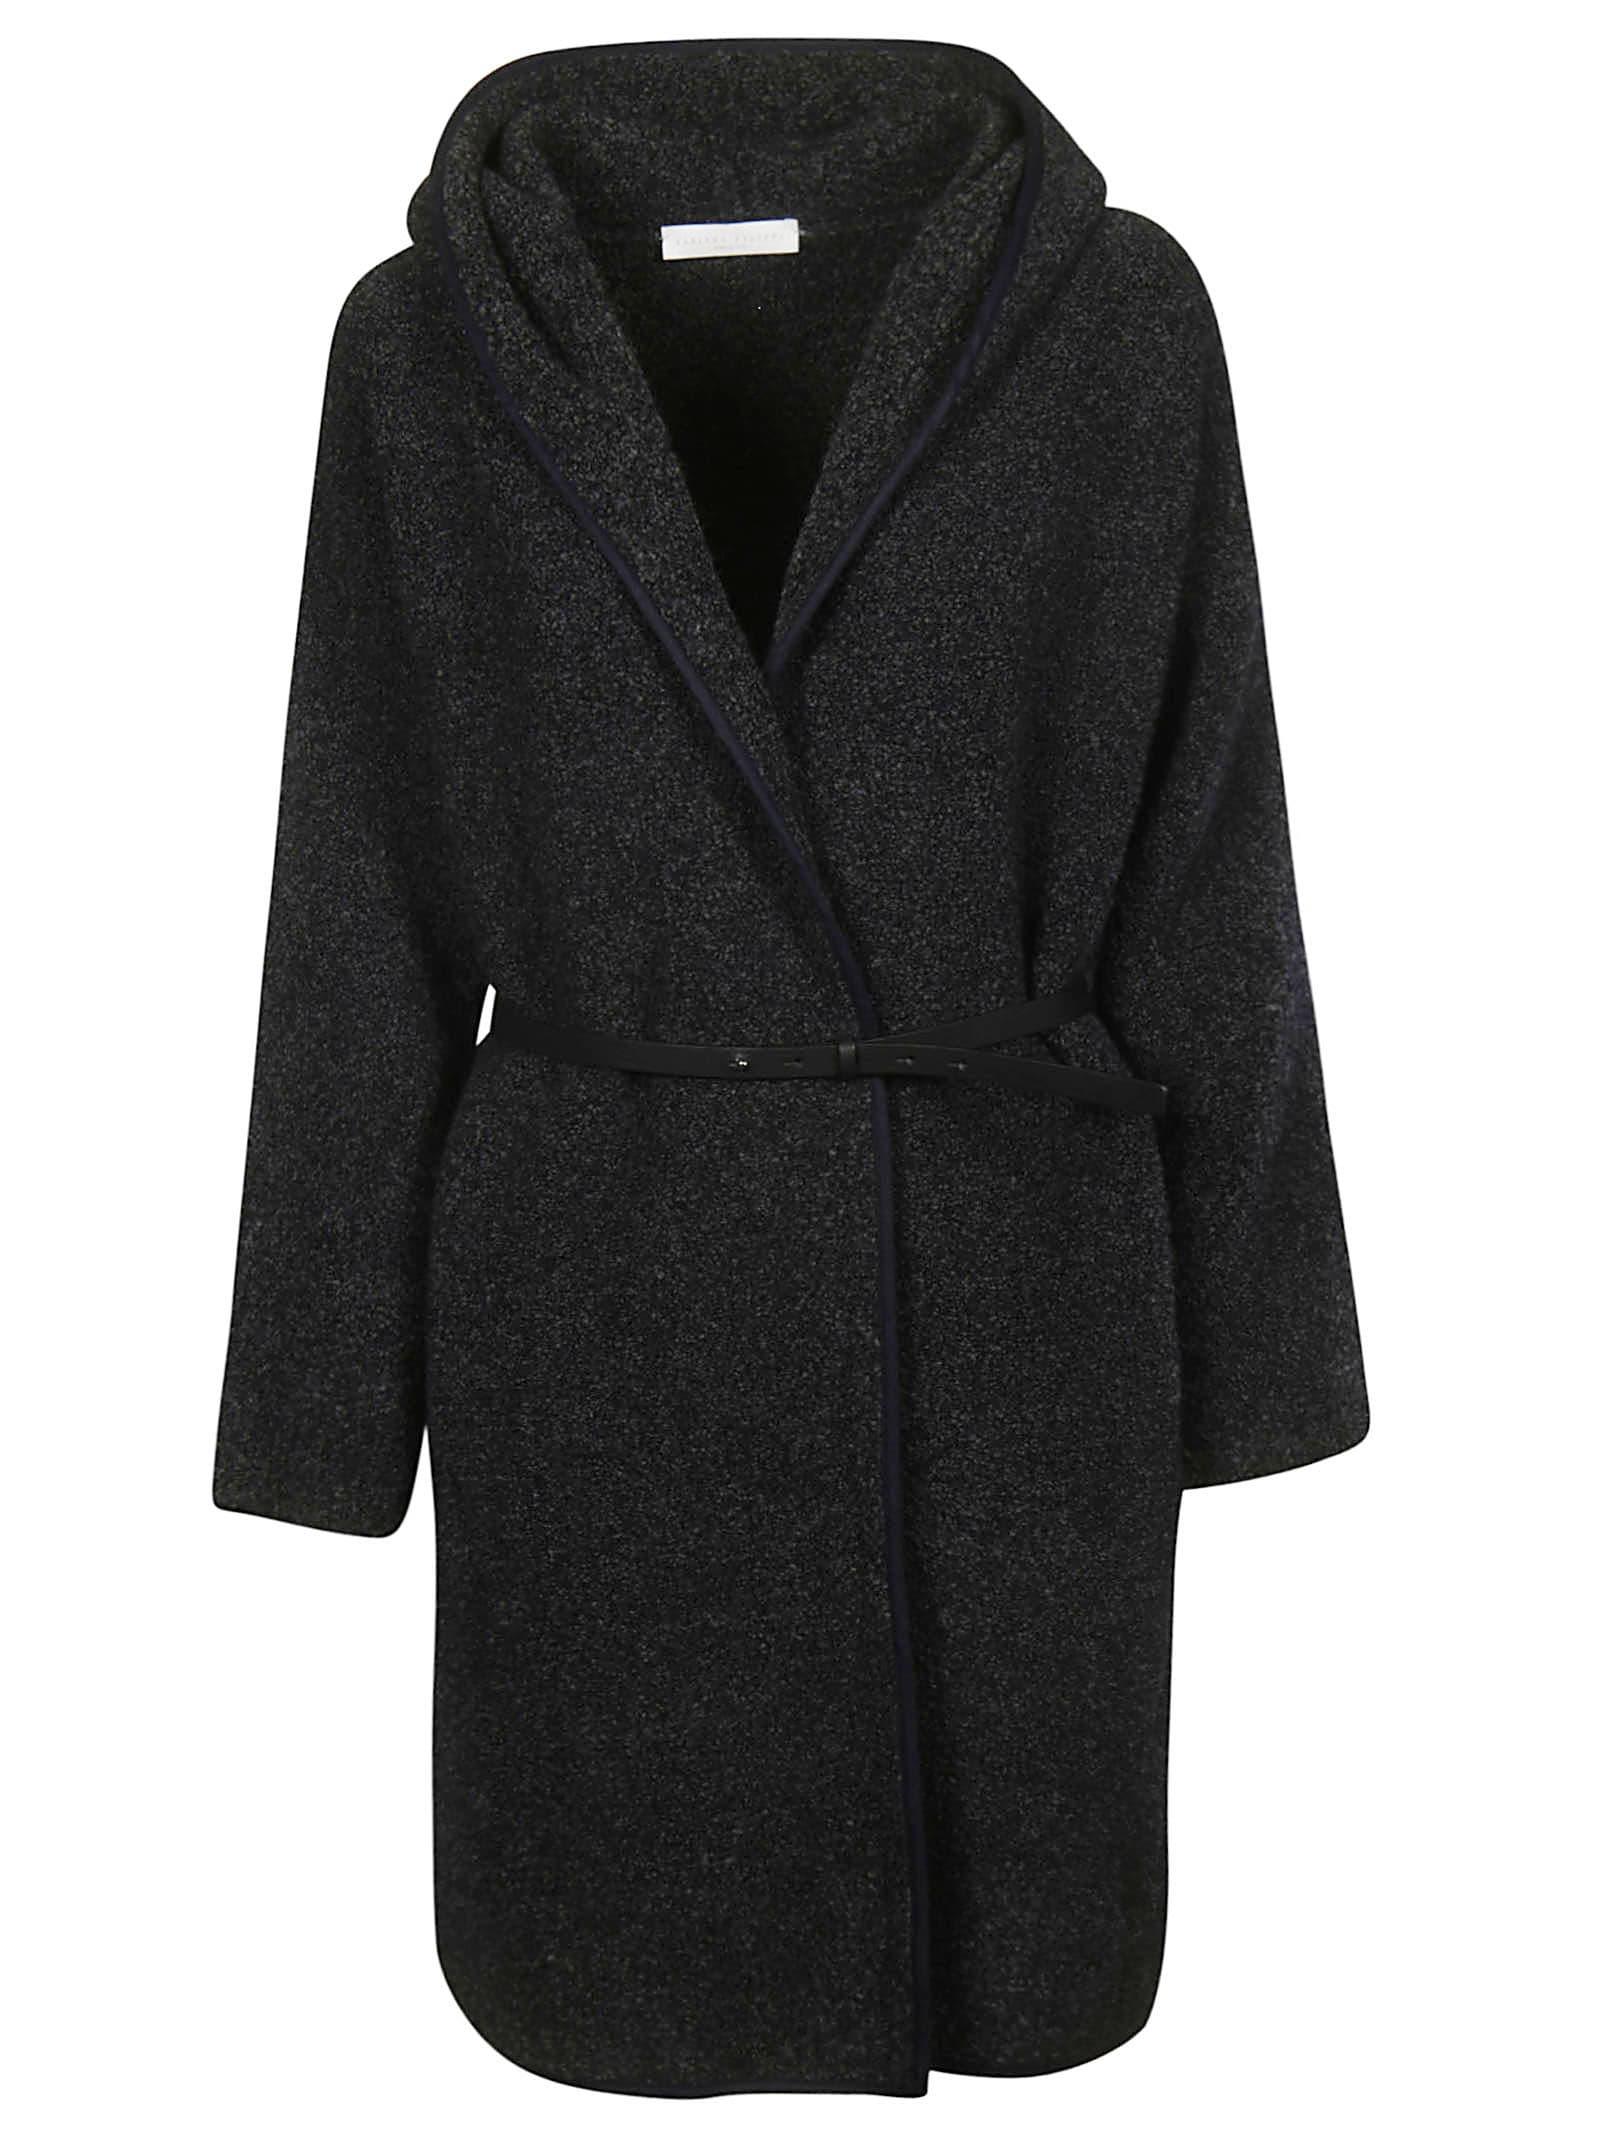 Photo of  Fabiana Filippi Wrapped Waist Coat- shop Fabiana Filippi jackets online sales